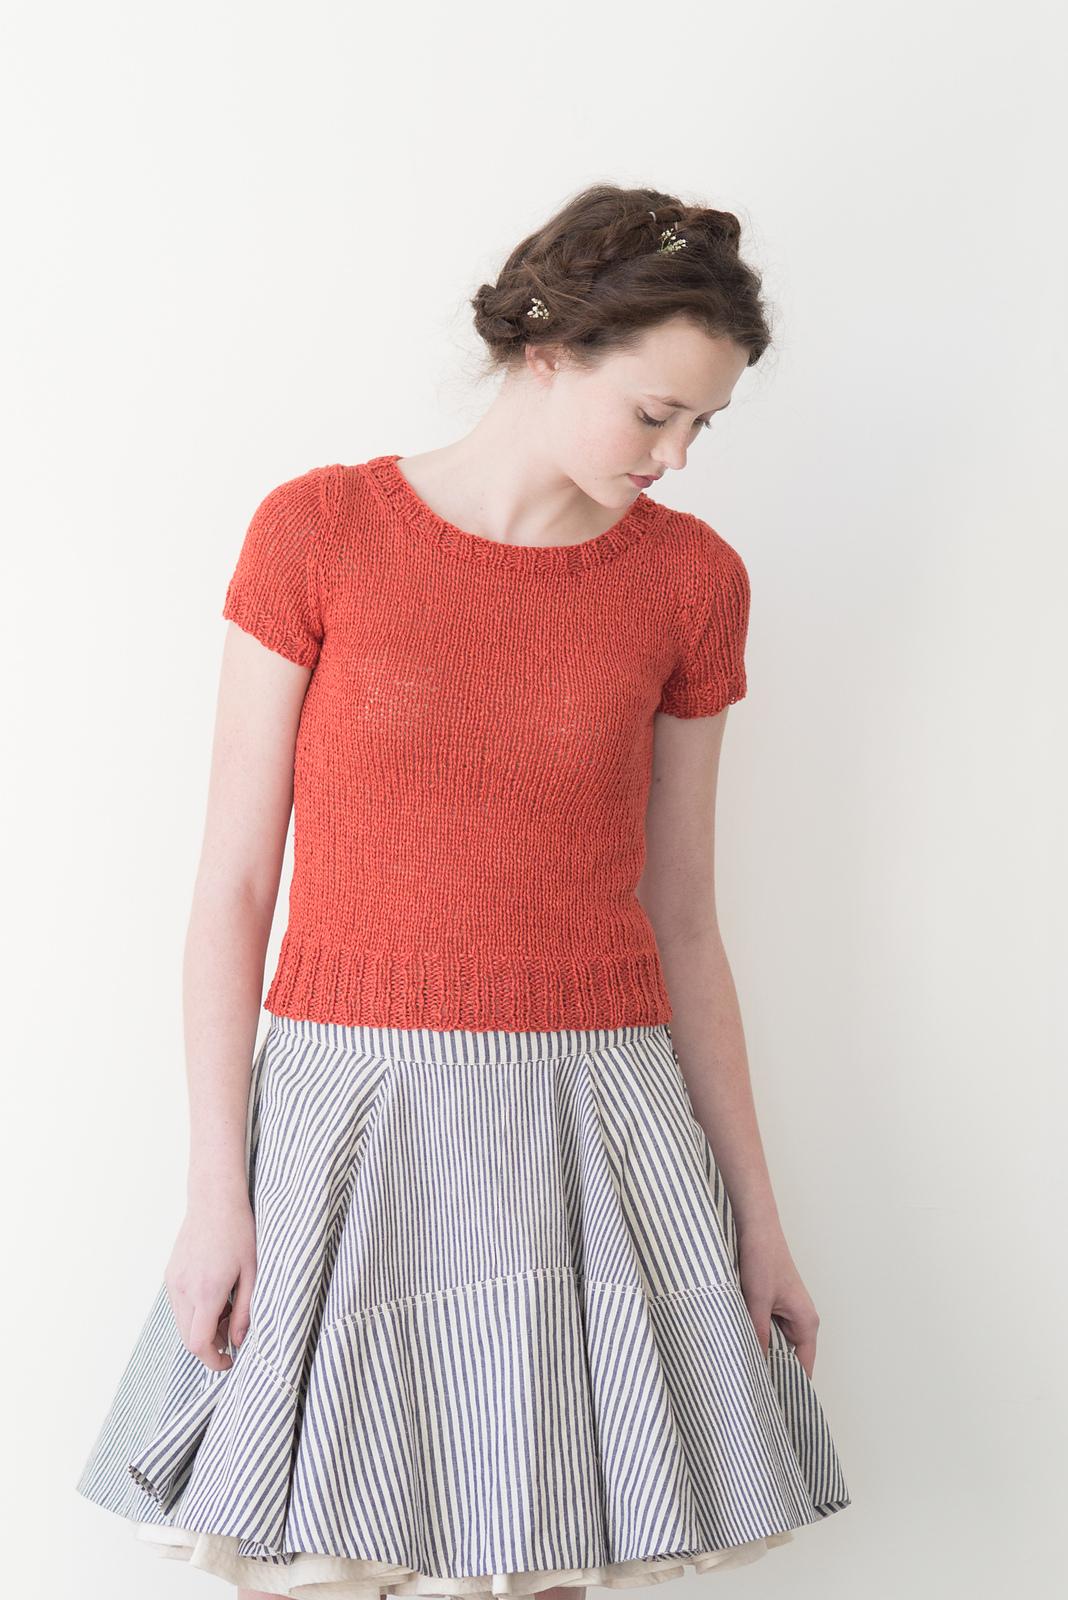 -quince-co-hibiscus-pam-allen-knitting-pattern-kestrel-1-7744.jpg